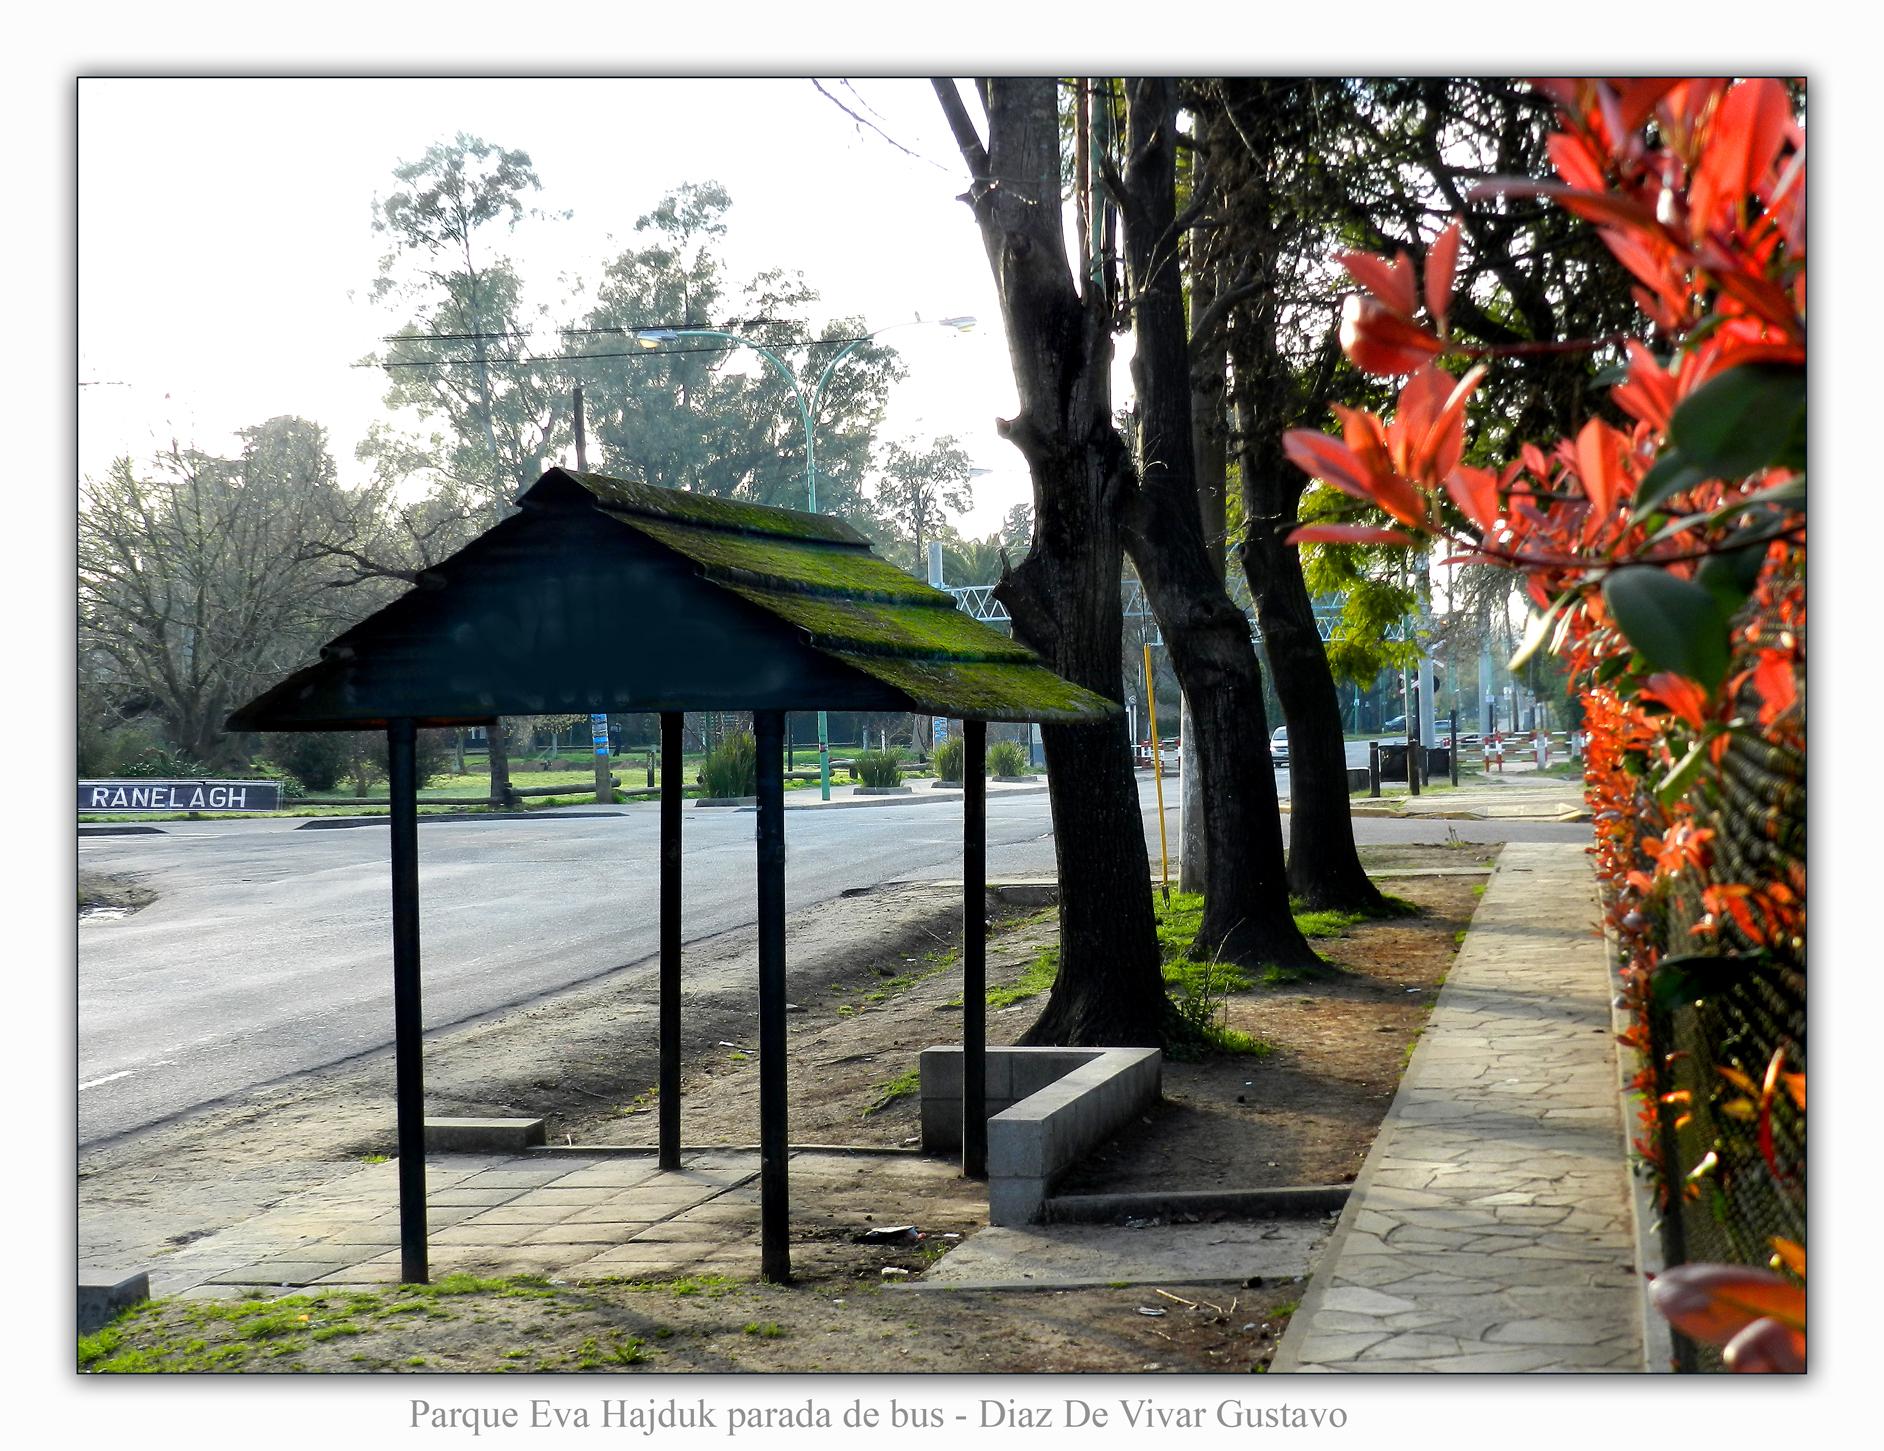 Parque Eva hajduk parada de bus  - Diaz De Vivar Gustavo